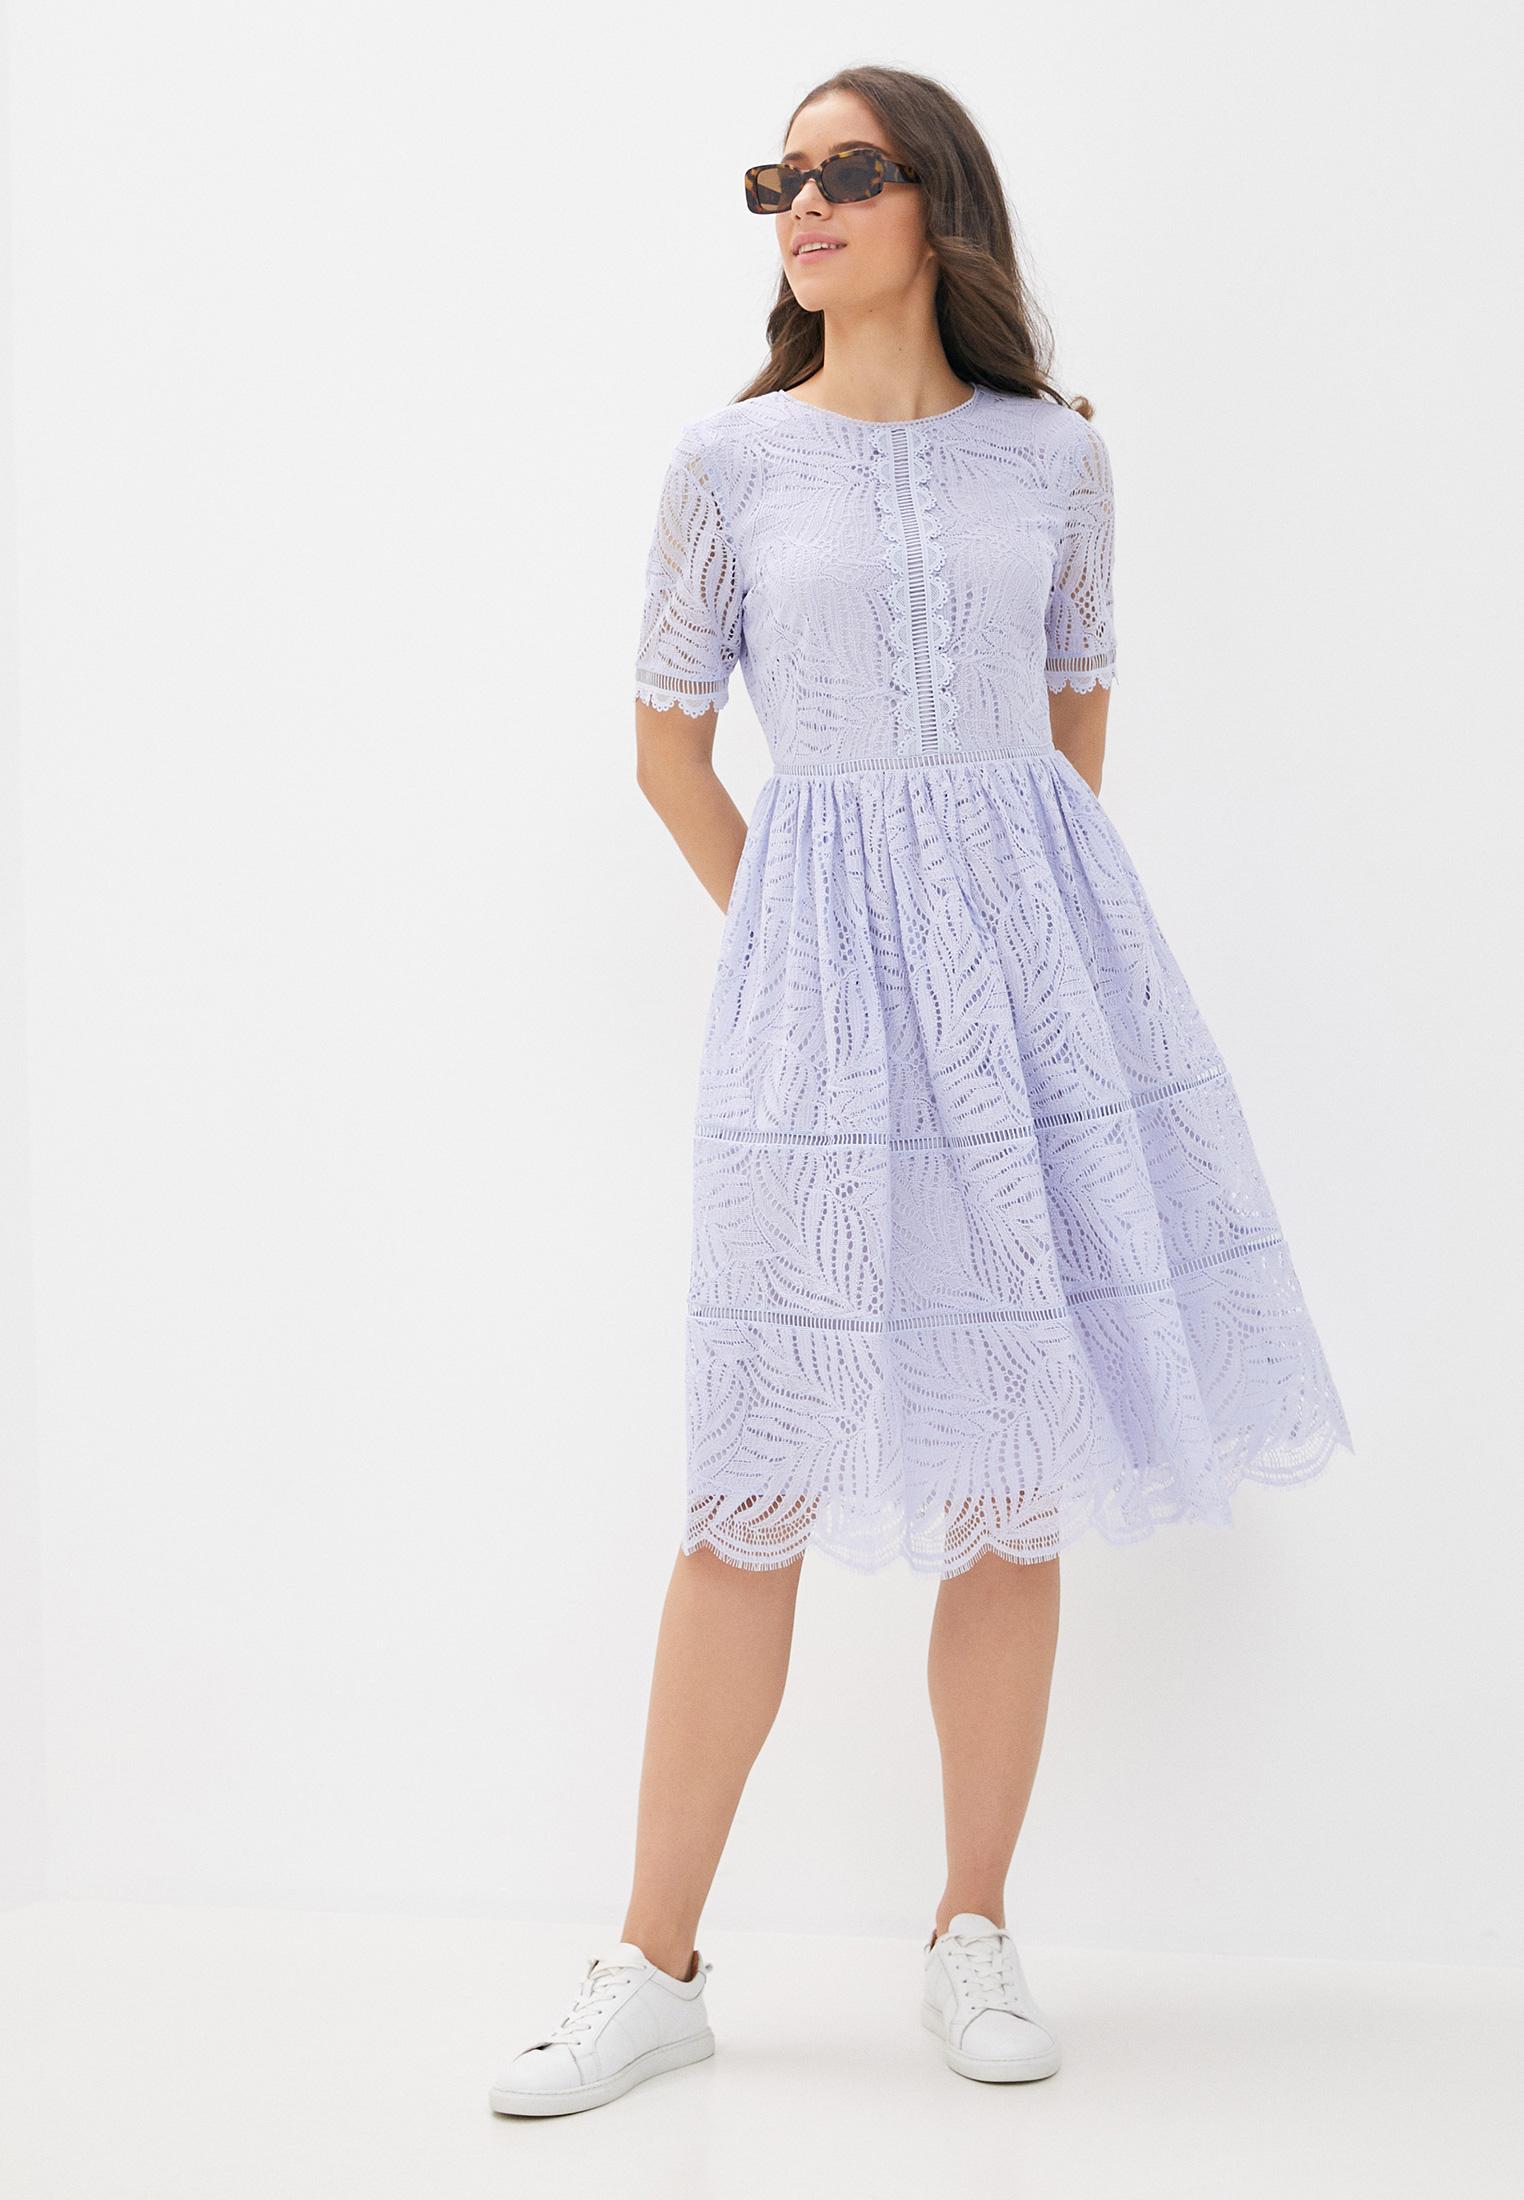 Платье Tommy Hilfiger (Томми Хилфигер) WW0WW28416